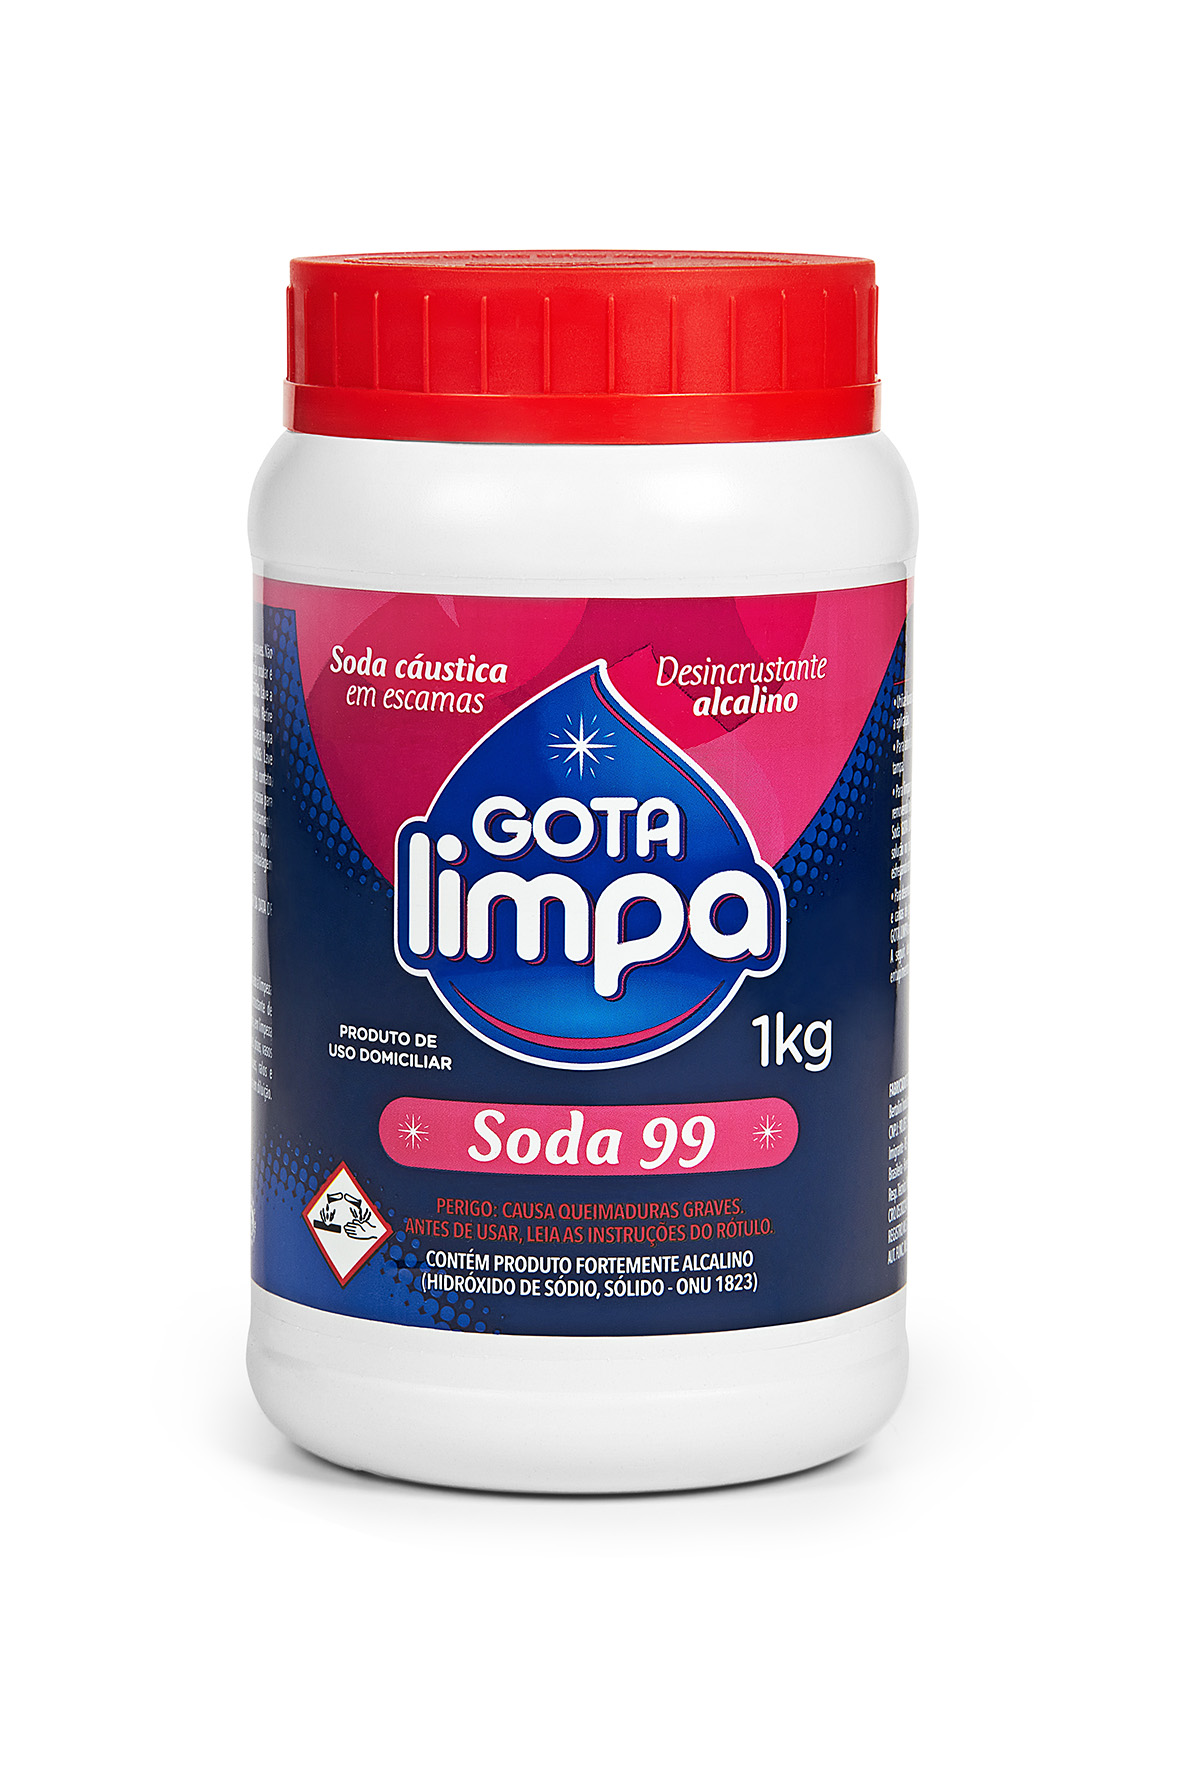 Soda Cáustica Gota Limpa 1kg